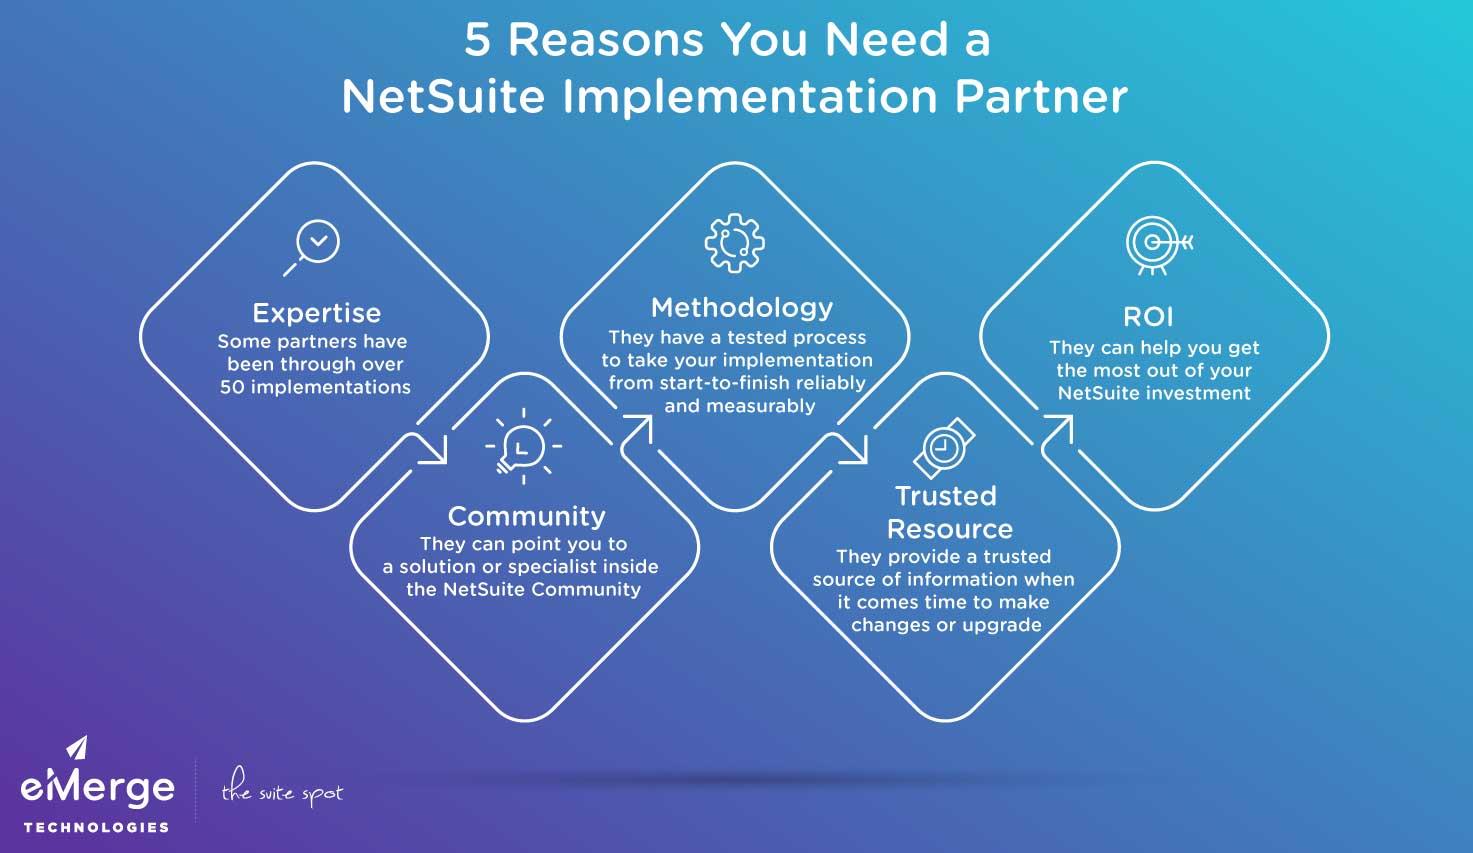 netsuite implementation partner